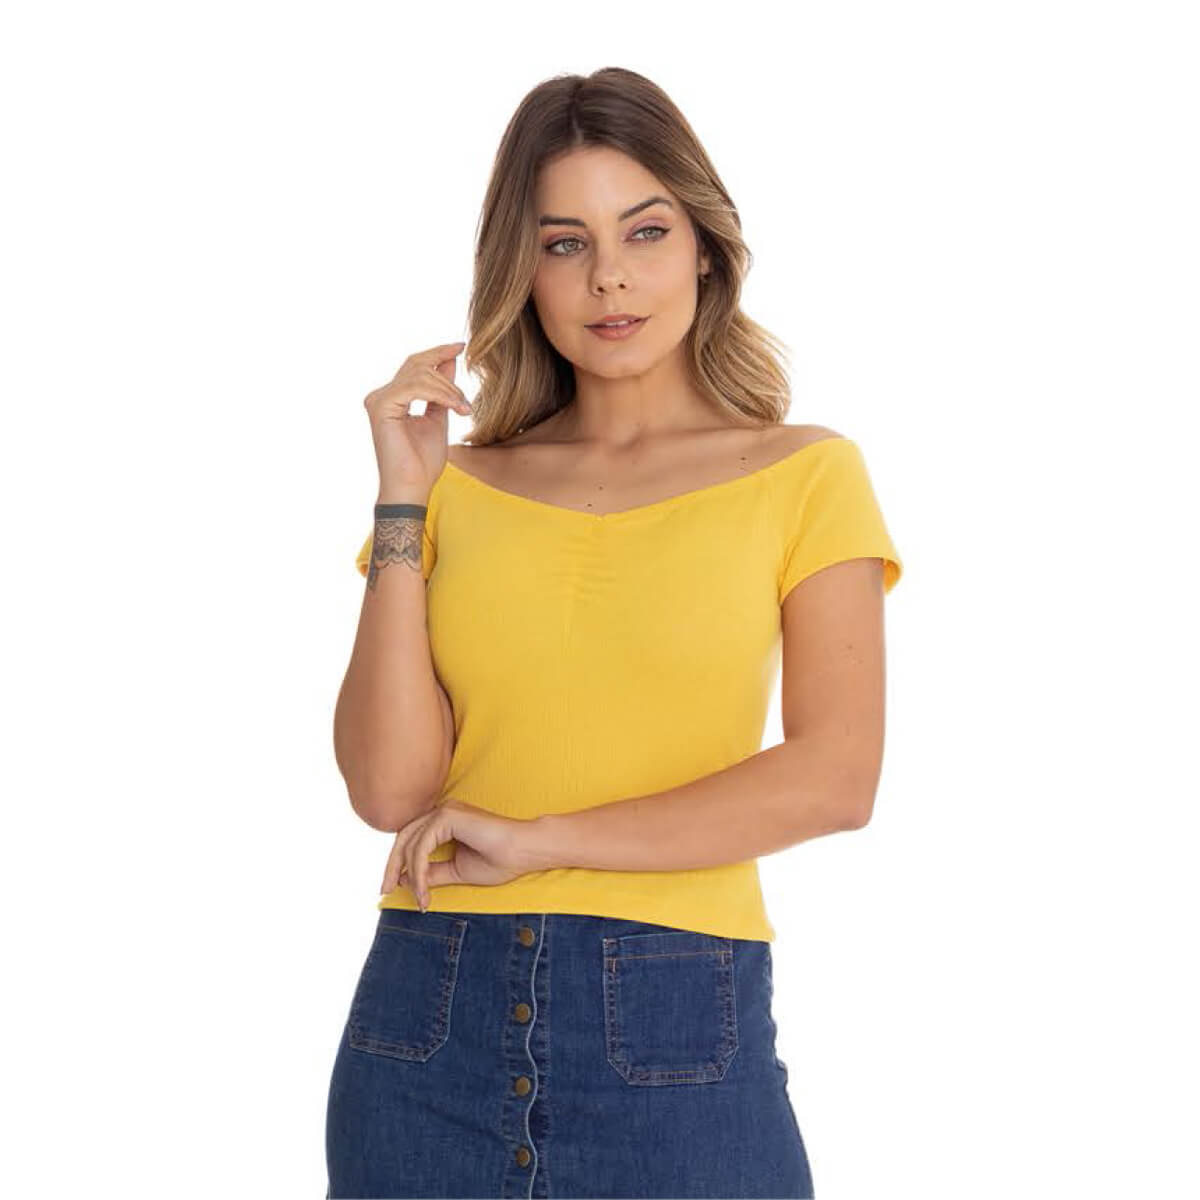 Blusa Feminina Cetim Canelada Ombro a Ombro Amarela